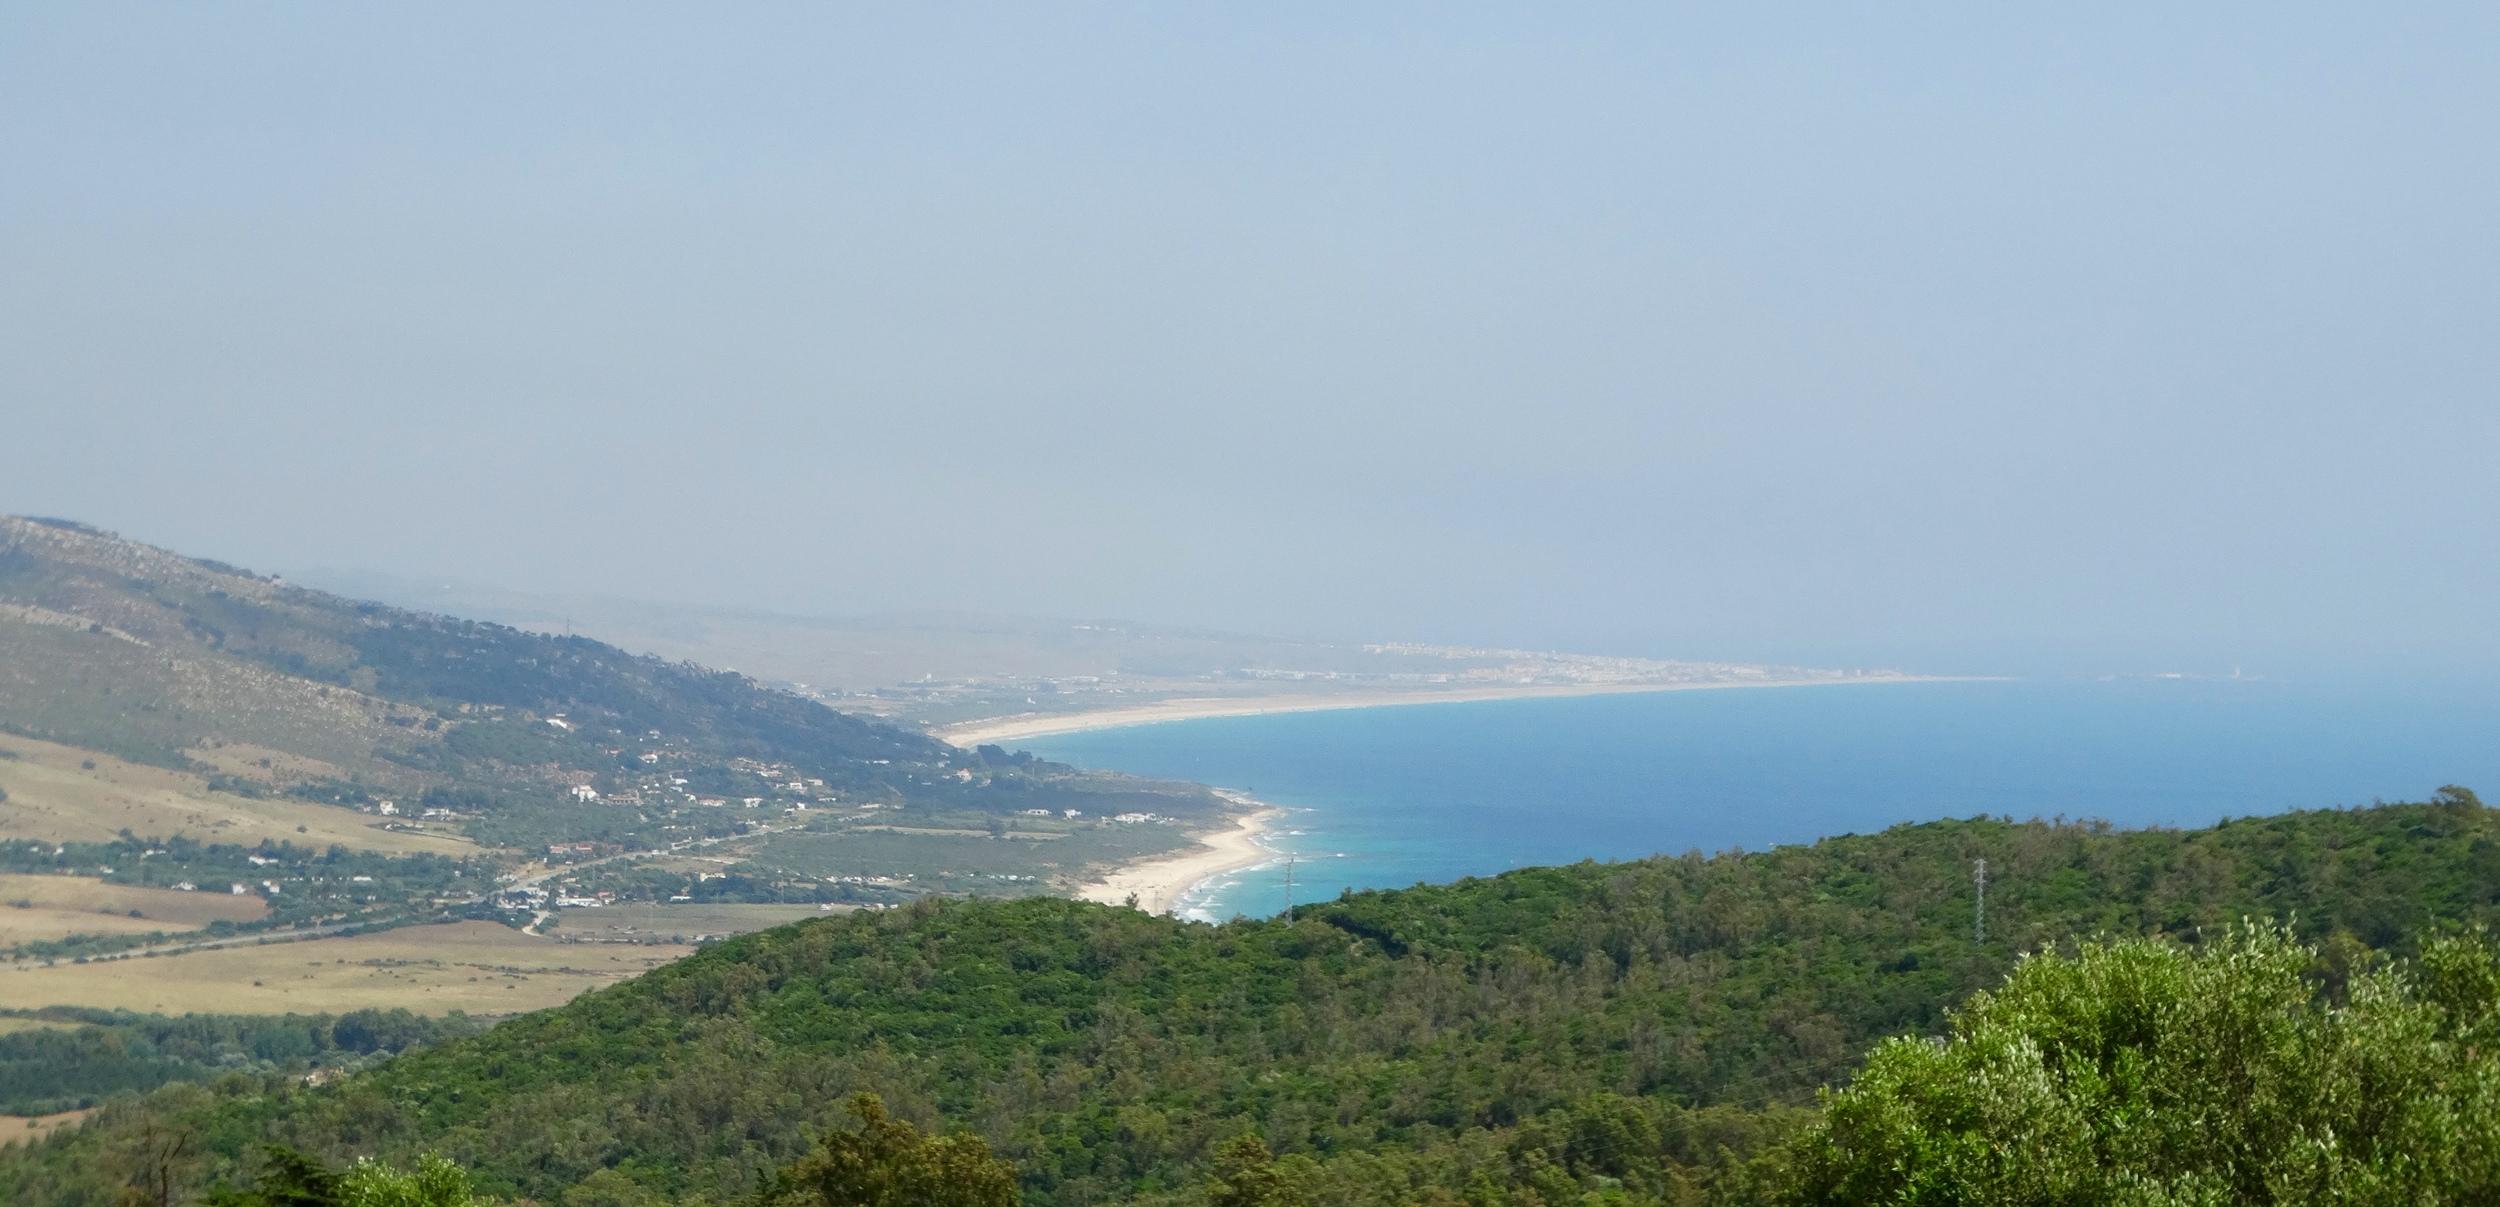 View from El Tesoro